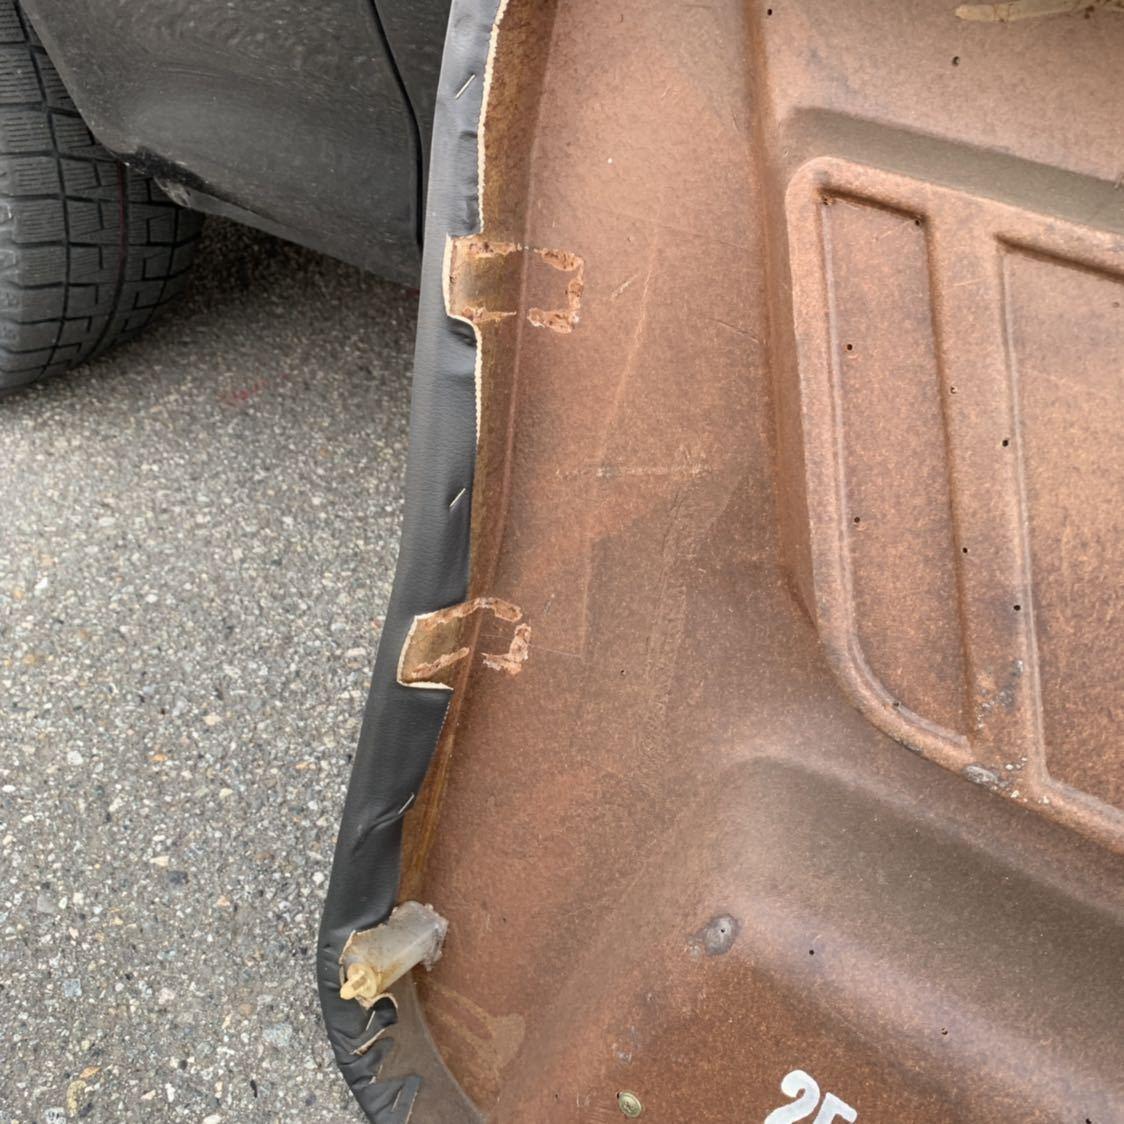 HR31 R31 スカイライン 2ドア GTS-R 右側 ドア内張り 穴あけ有り 限定車 ニスモ仕様_台座2ヶ所欠品